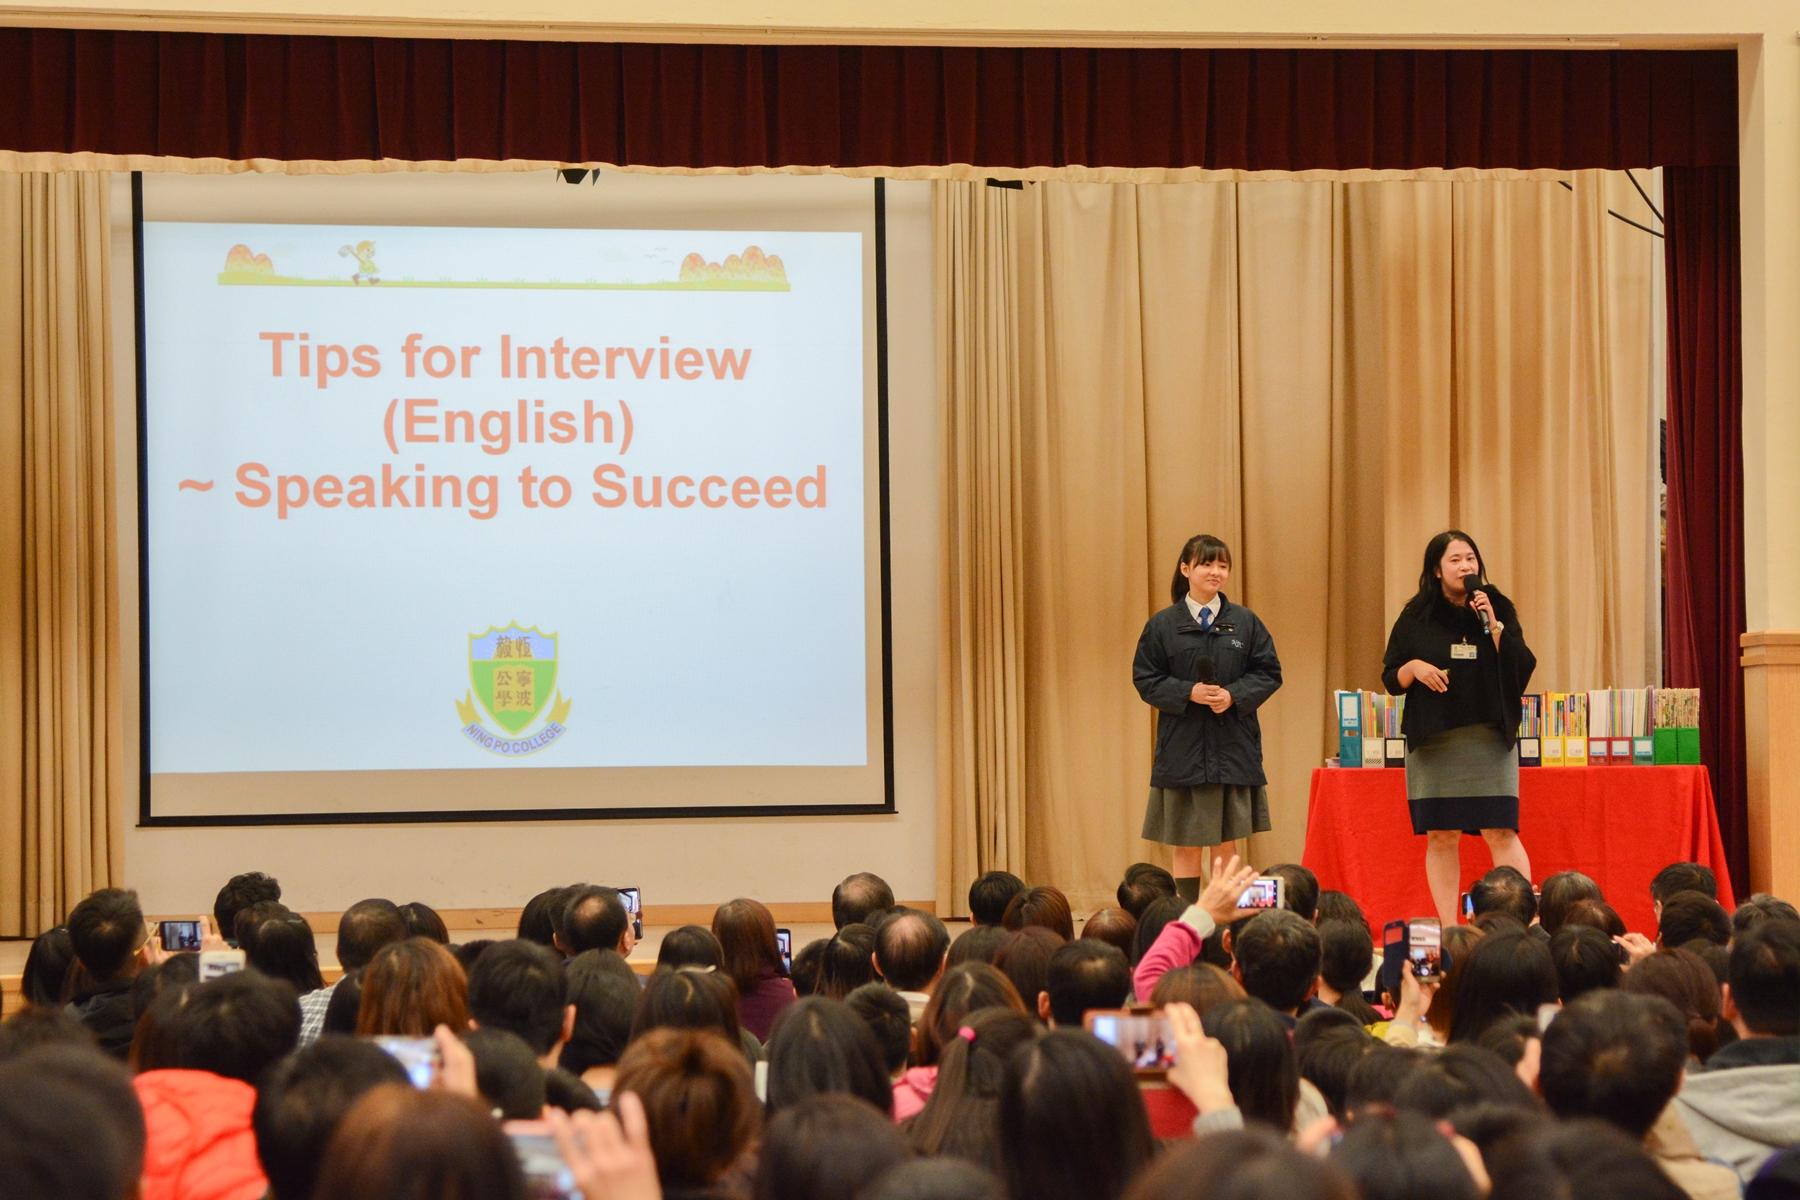 http://www.npc.edu.hk/sites/default/files/14_114.jpg